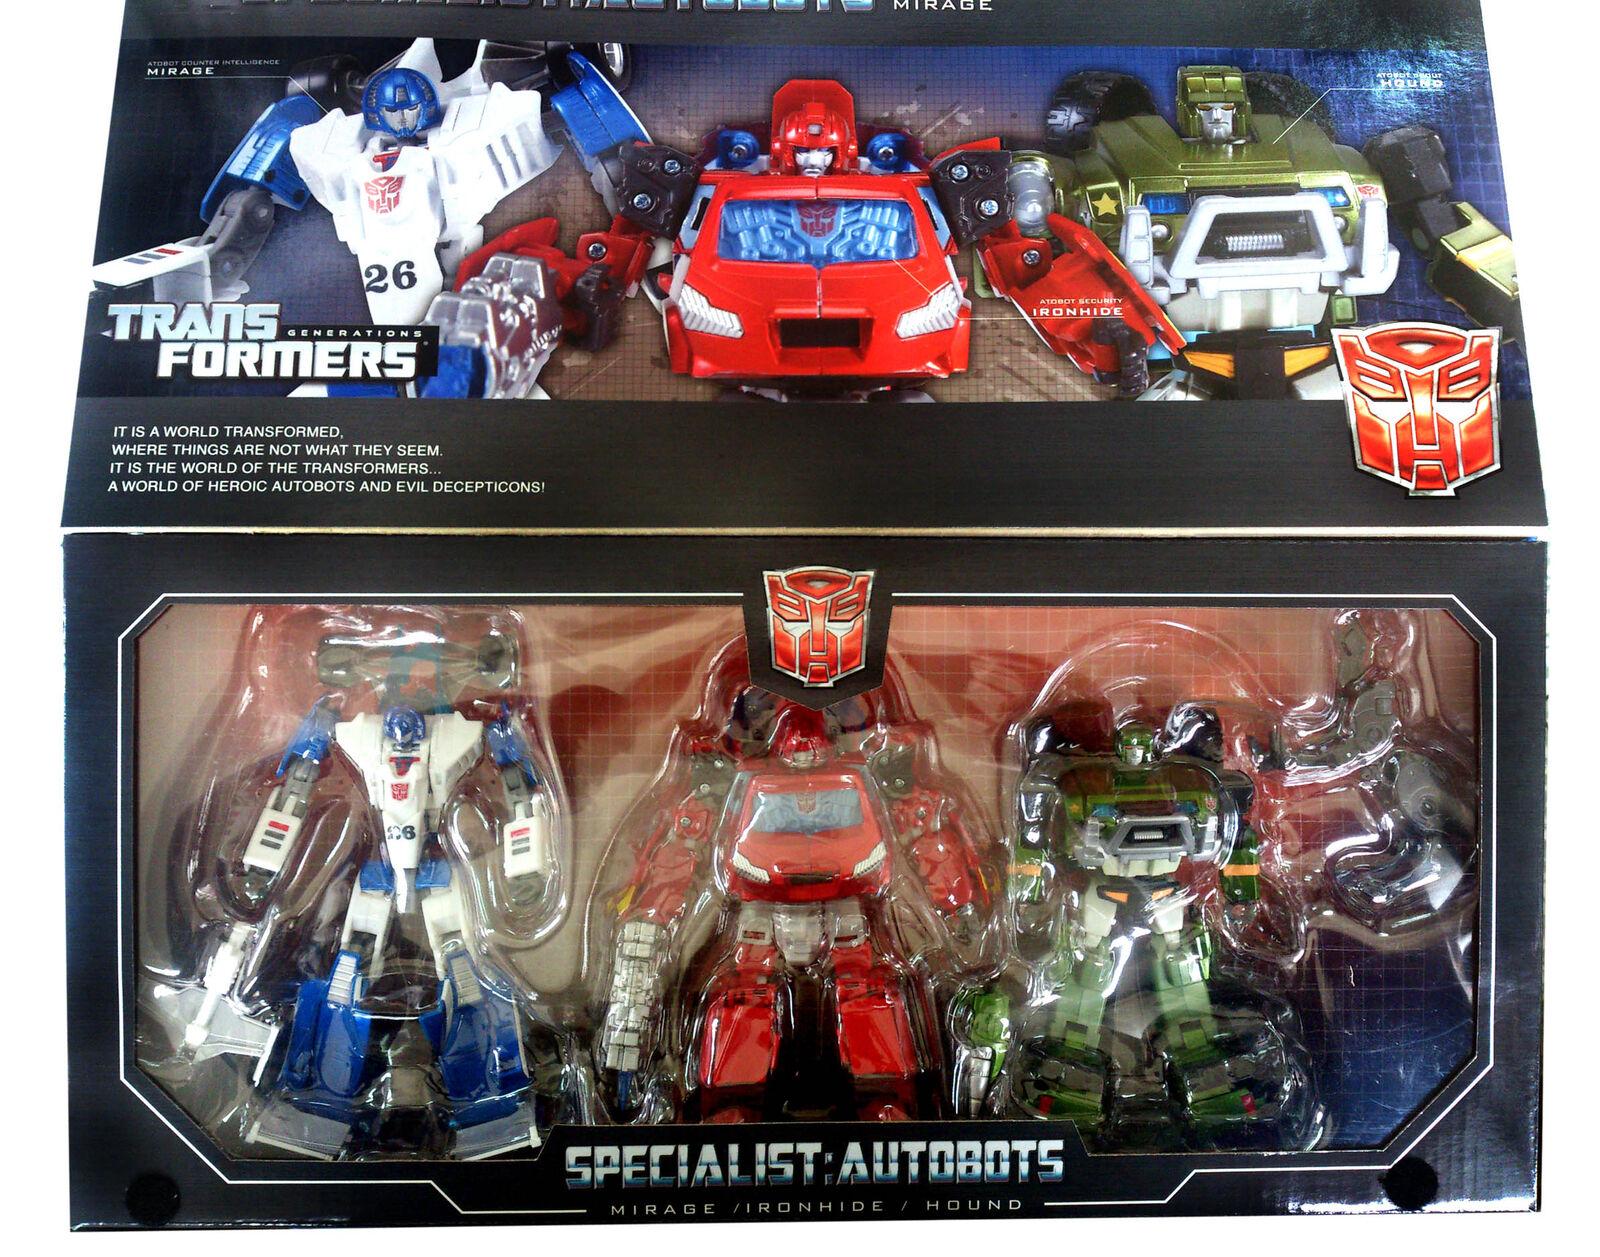 Takara Transformers Henkei Asia Autobot Specialists Ironhide Hound Mirage UK